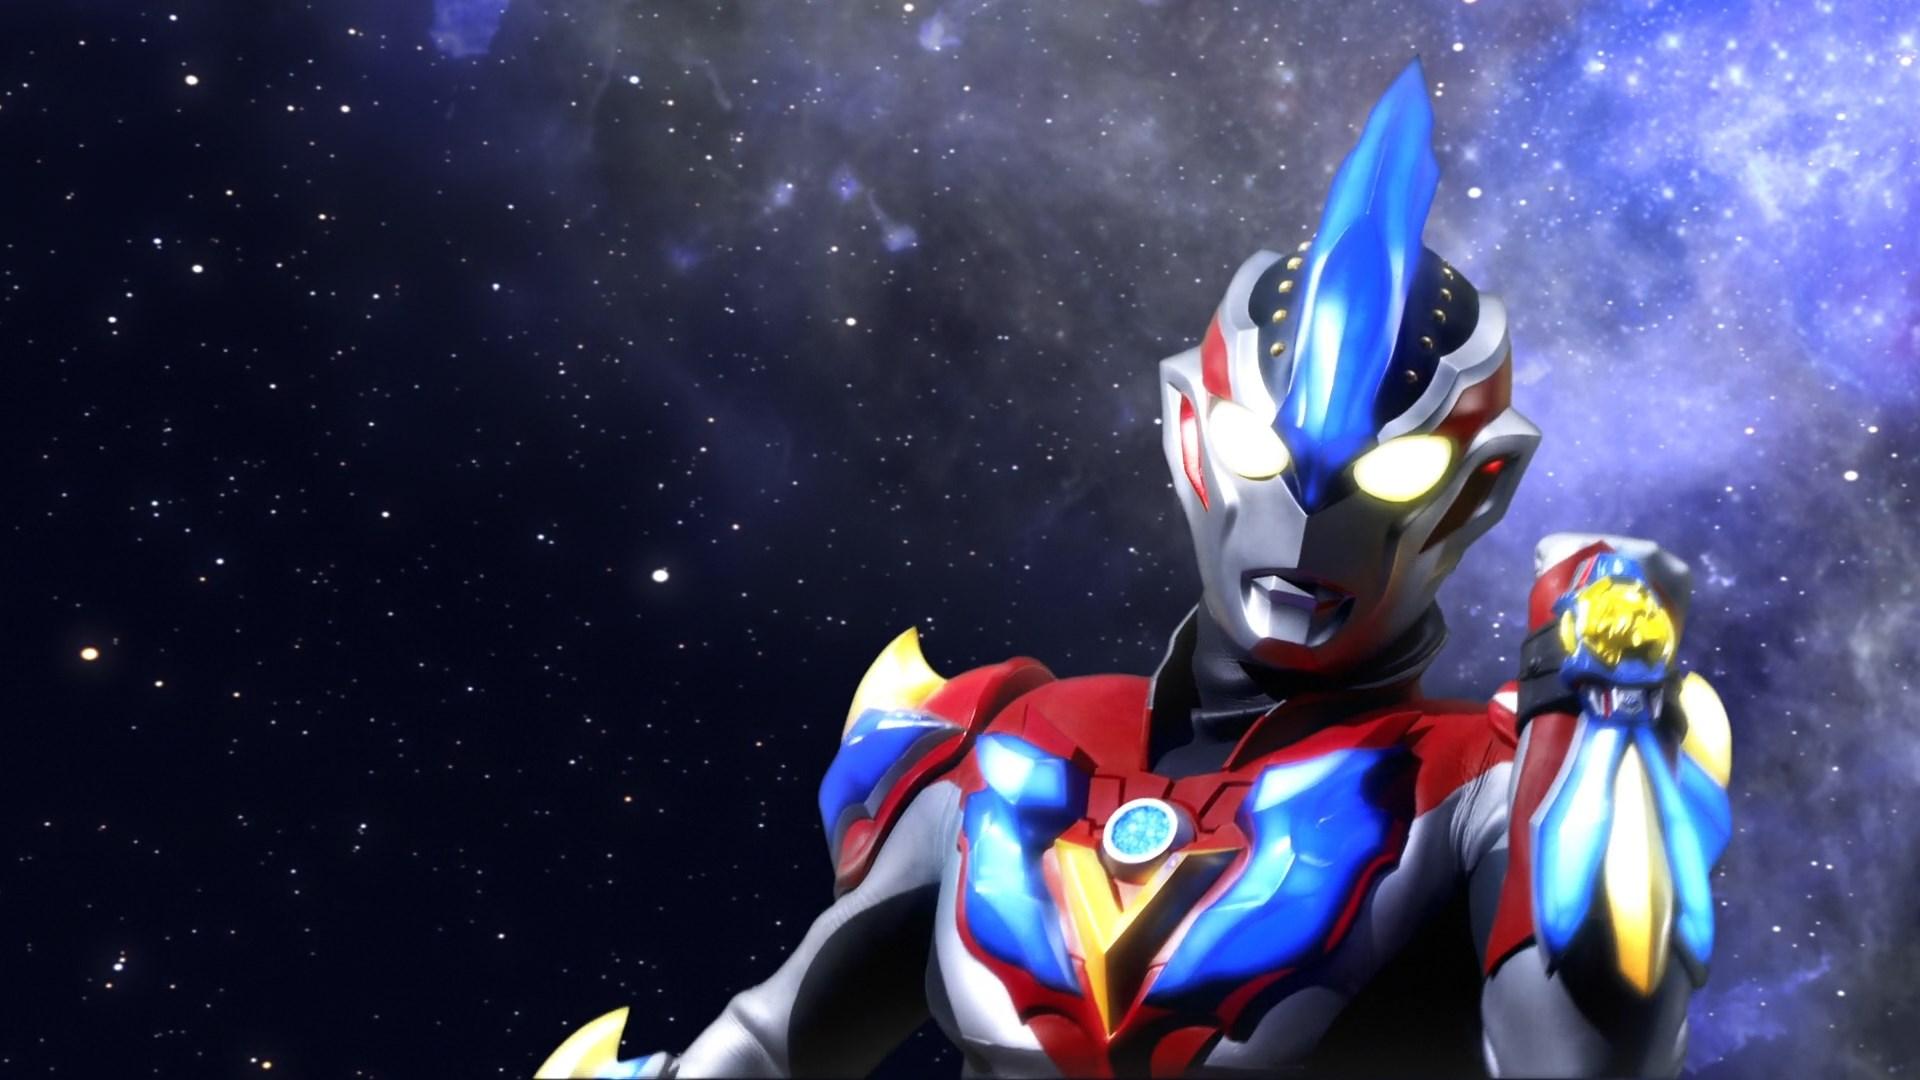 Msubs Ultraman Ginga S Showdown The 10 Ultra Warriors 1080 5a0b1b3c Mkv Snapshot 00 55 57 2016 07 24 12 21 19